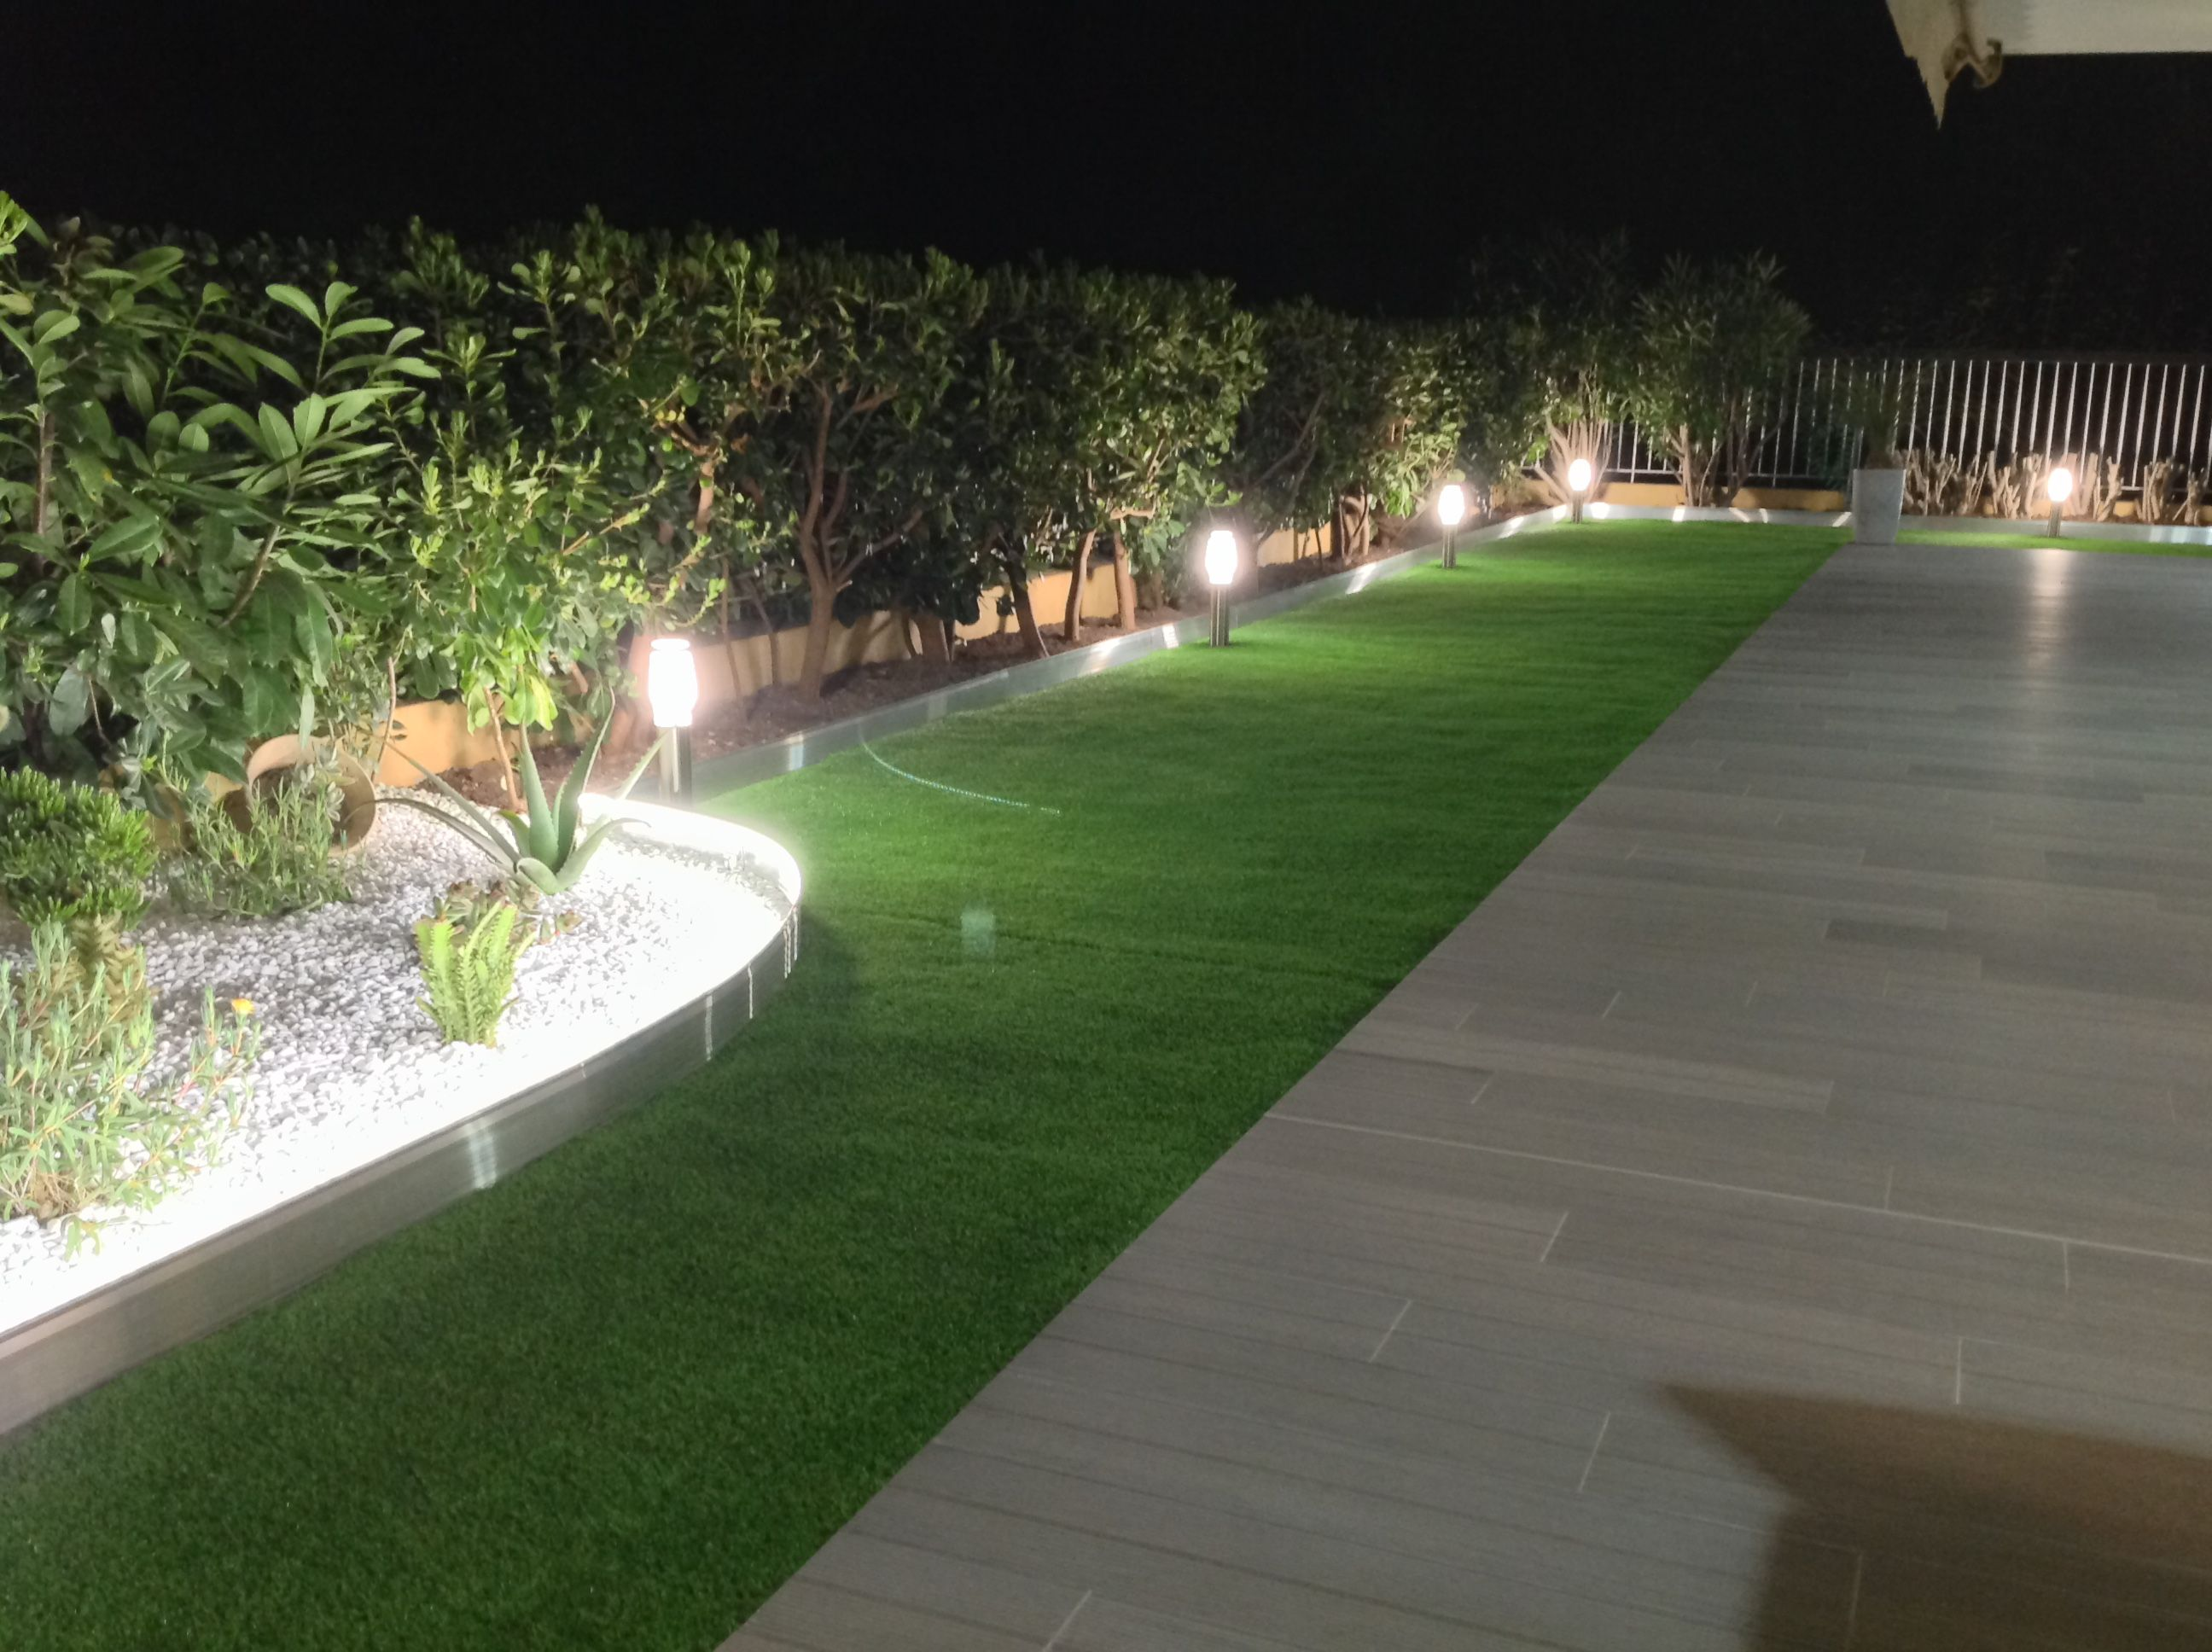 jardin design avec clairage int gr dans les bordures jardin apanages bordure bordures ga. Black Bedroom Furniture Sets. Home Design Ideas